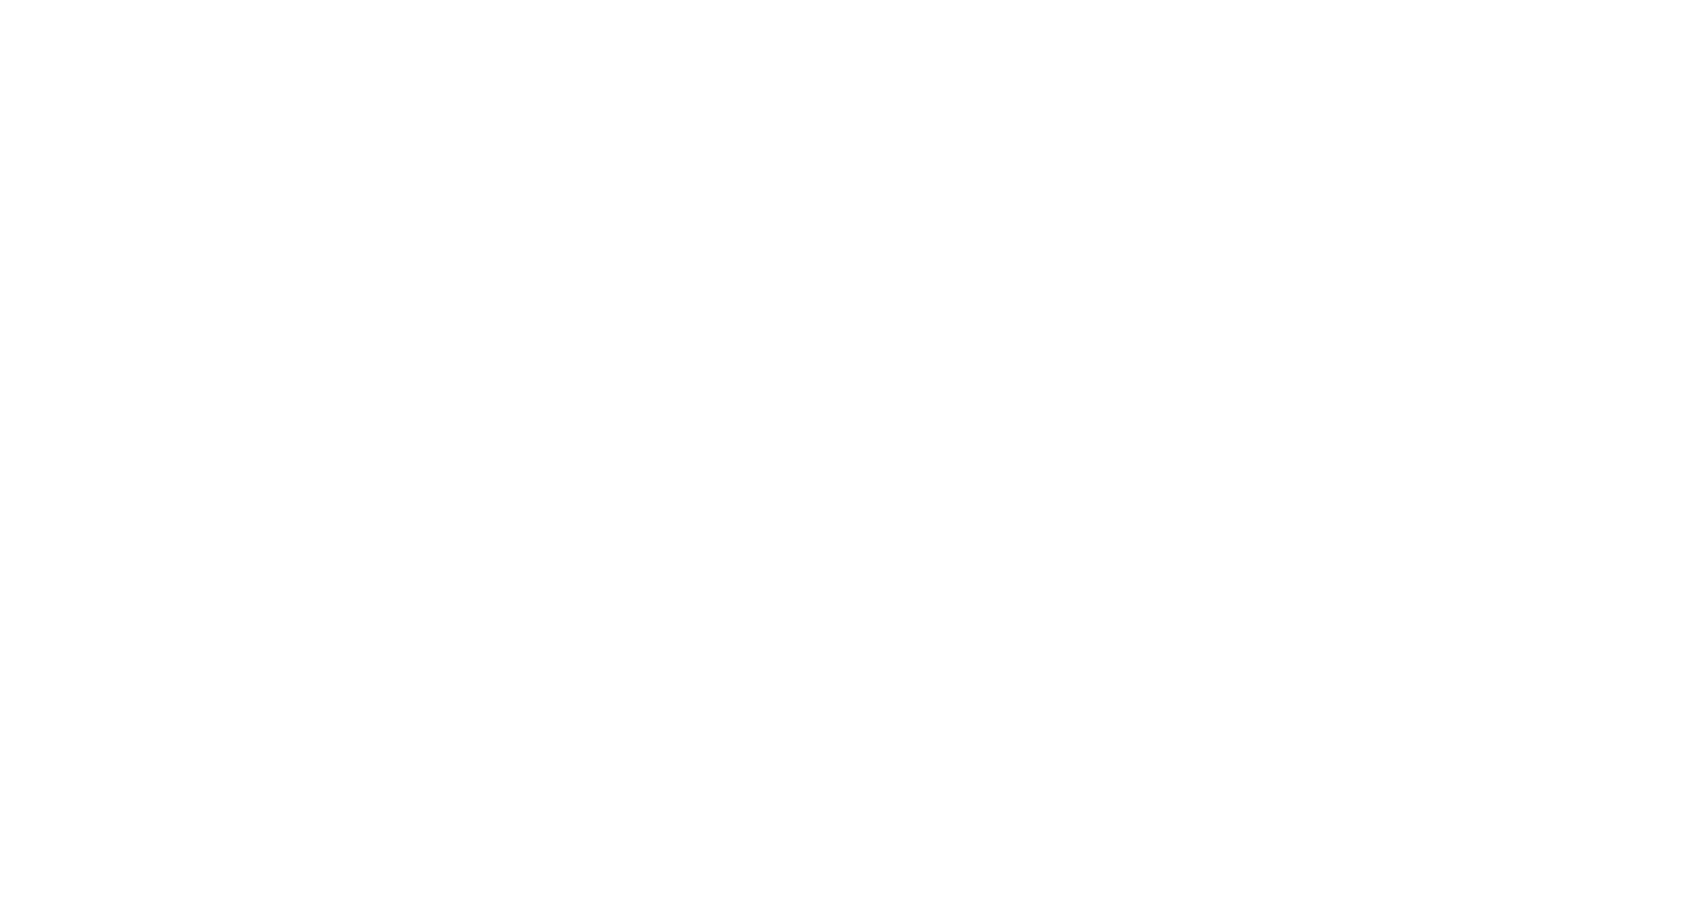 ezwheel partenaires french fab